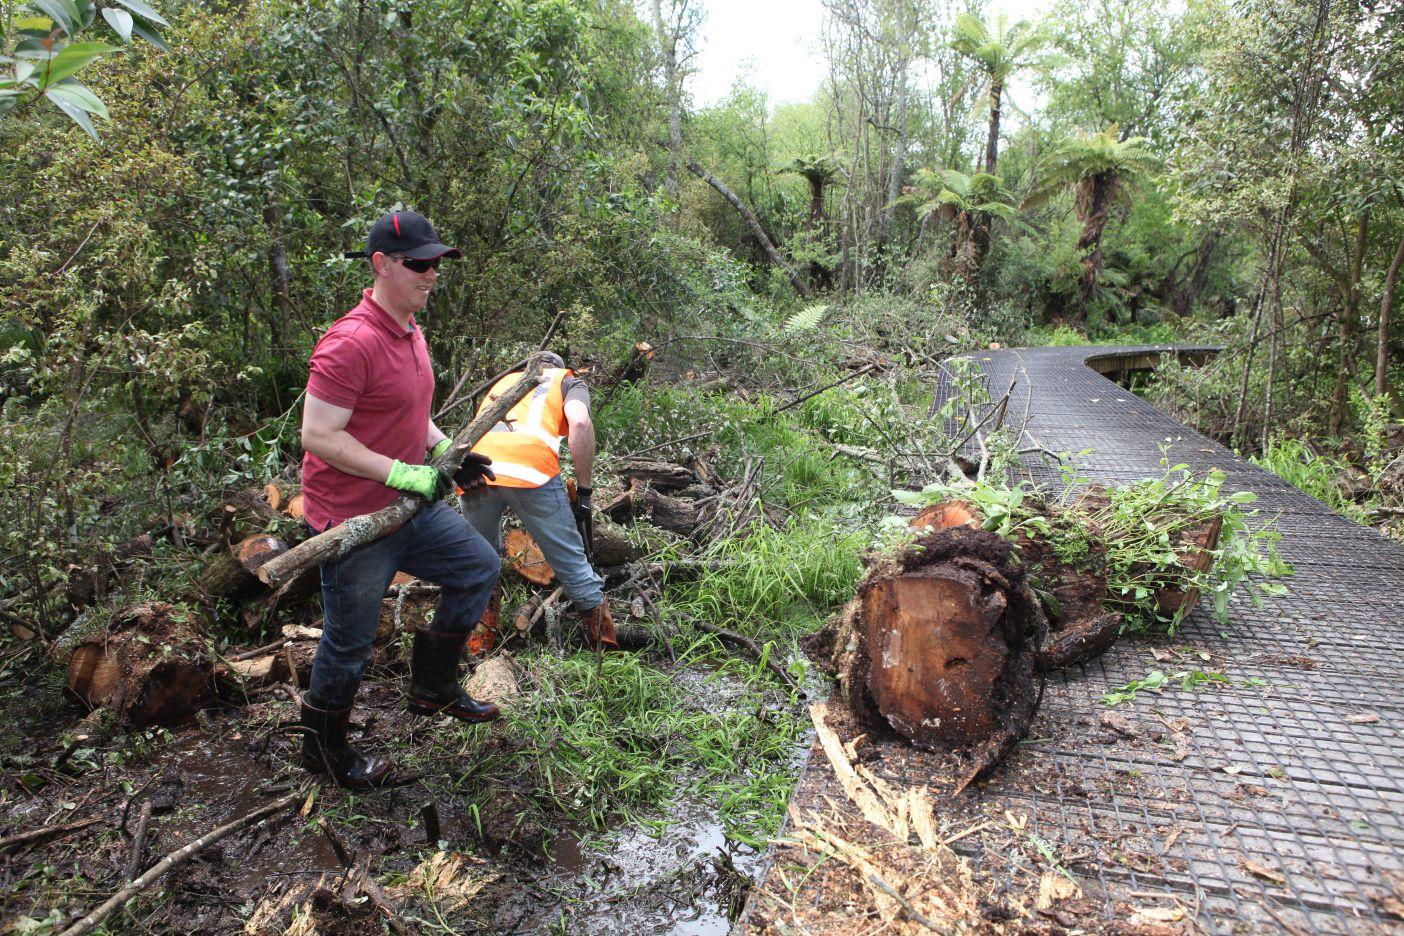 Act-of-Kindness-Volunteer-Waikato-River-Trails-IMG_0595.JPG